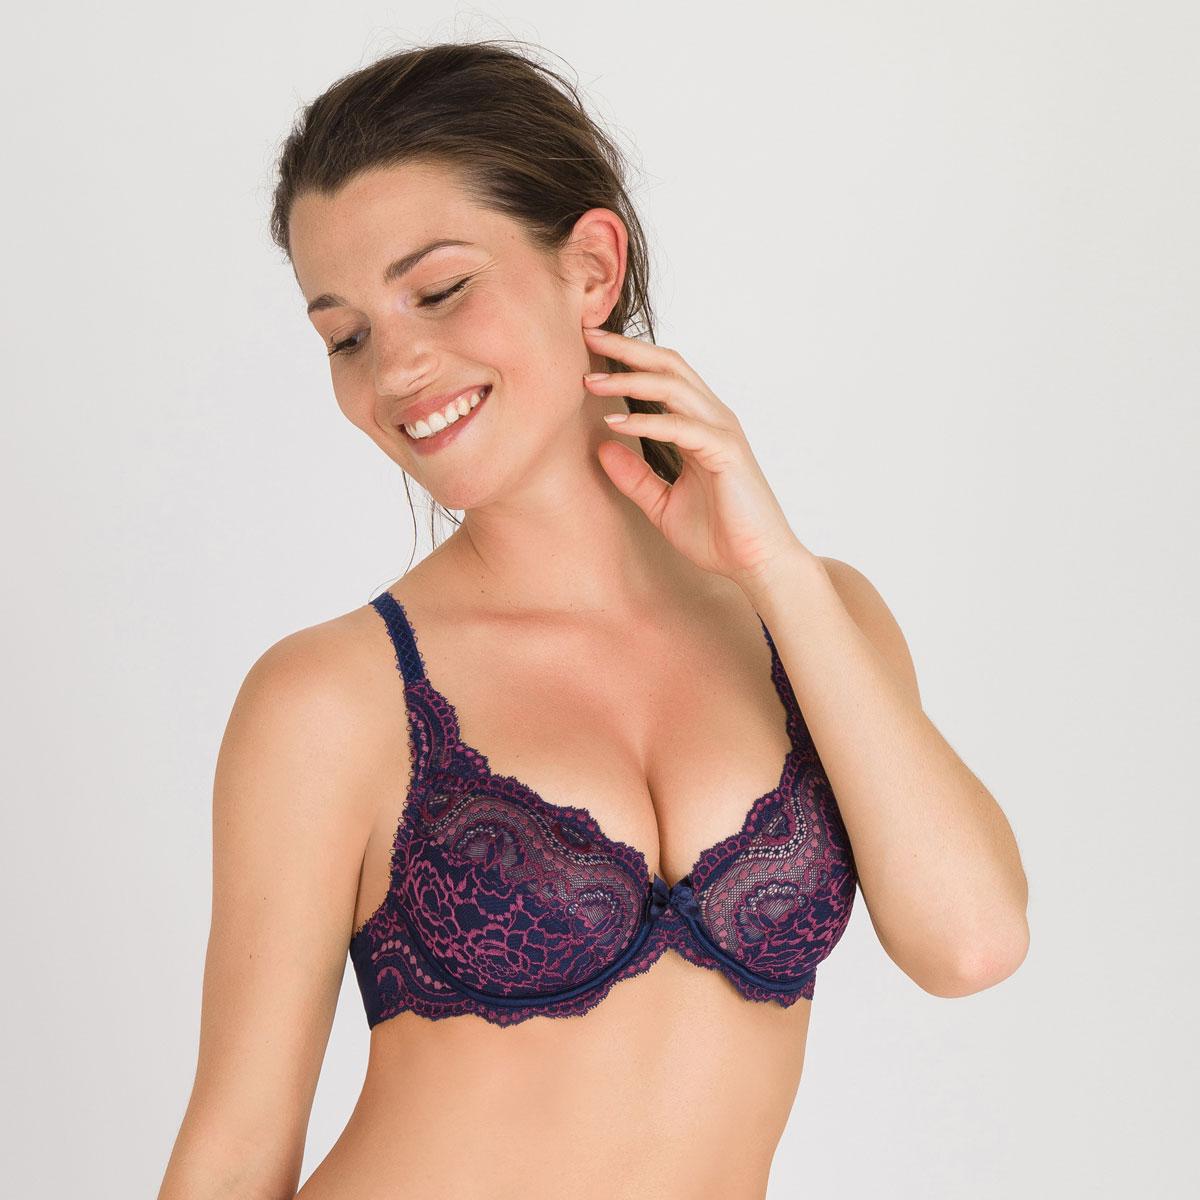 0f11e60be339b Full Cup Bra in Dark Blue Purple - Flower Elegance